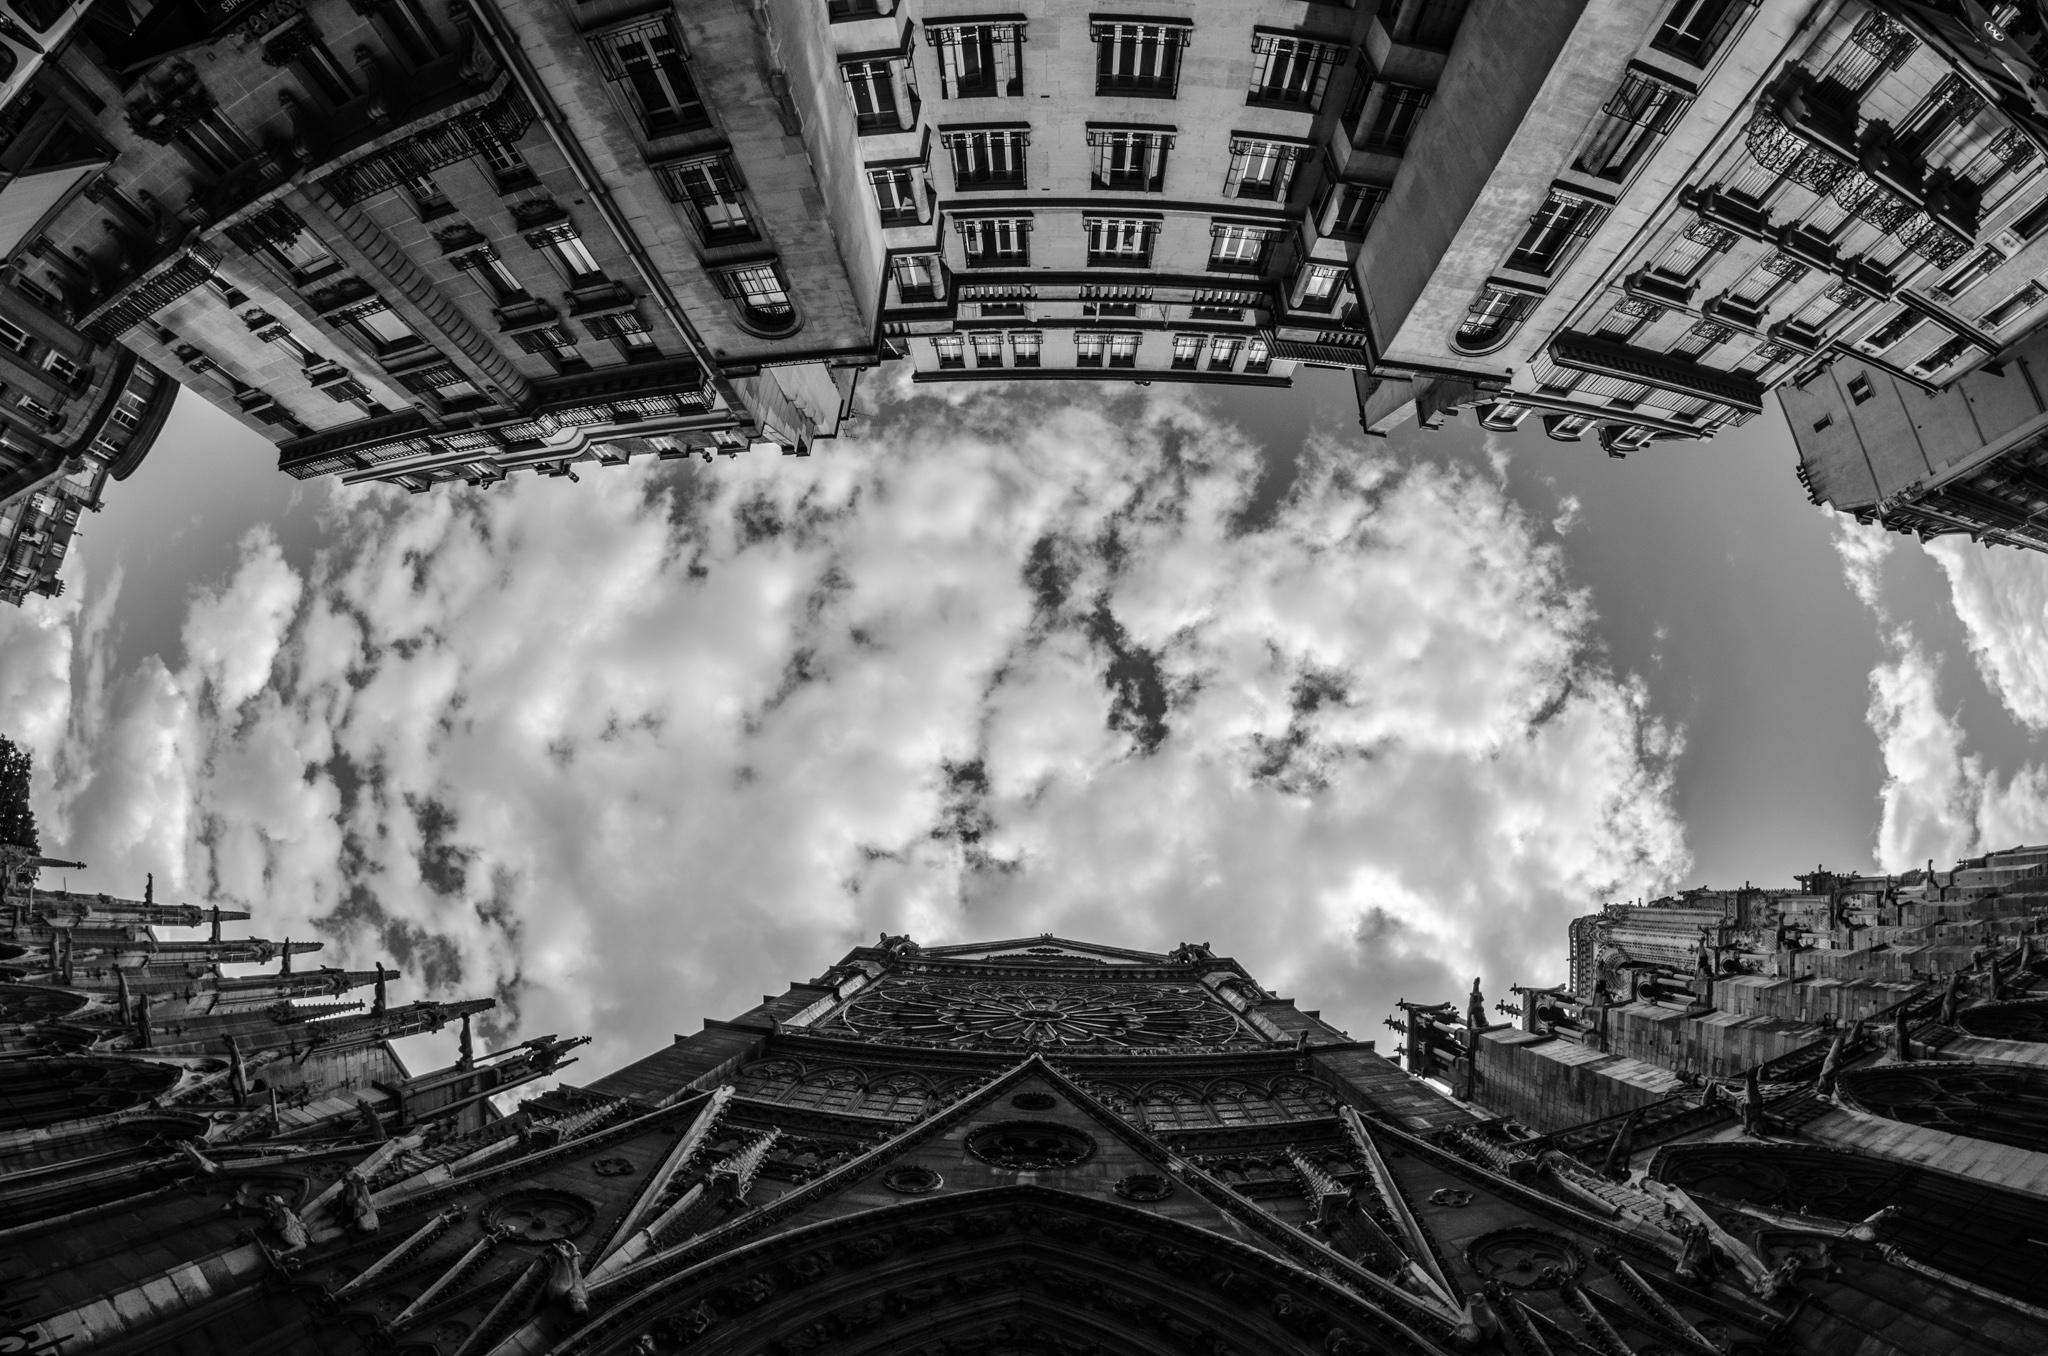 2015-07-29 - Jamritha Honeymoon - 002 - Cathedrale Notr-Dame de Paris - 078